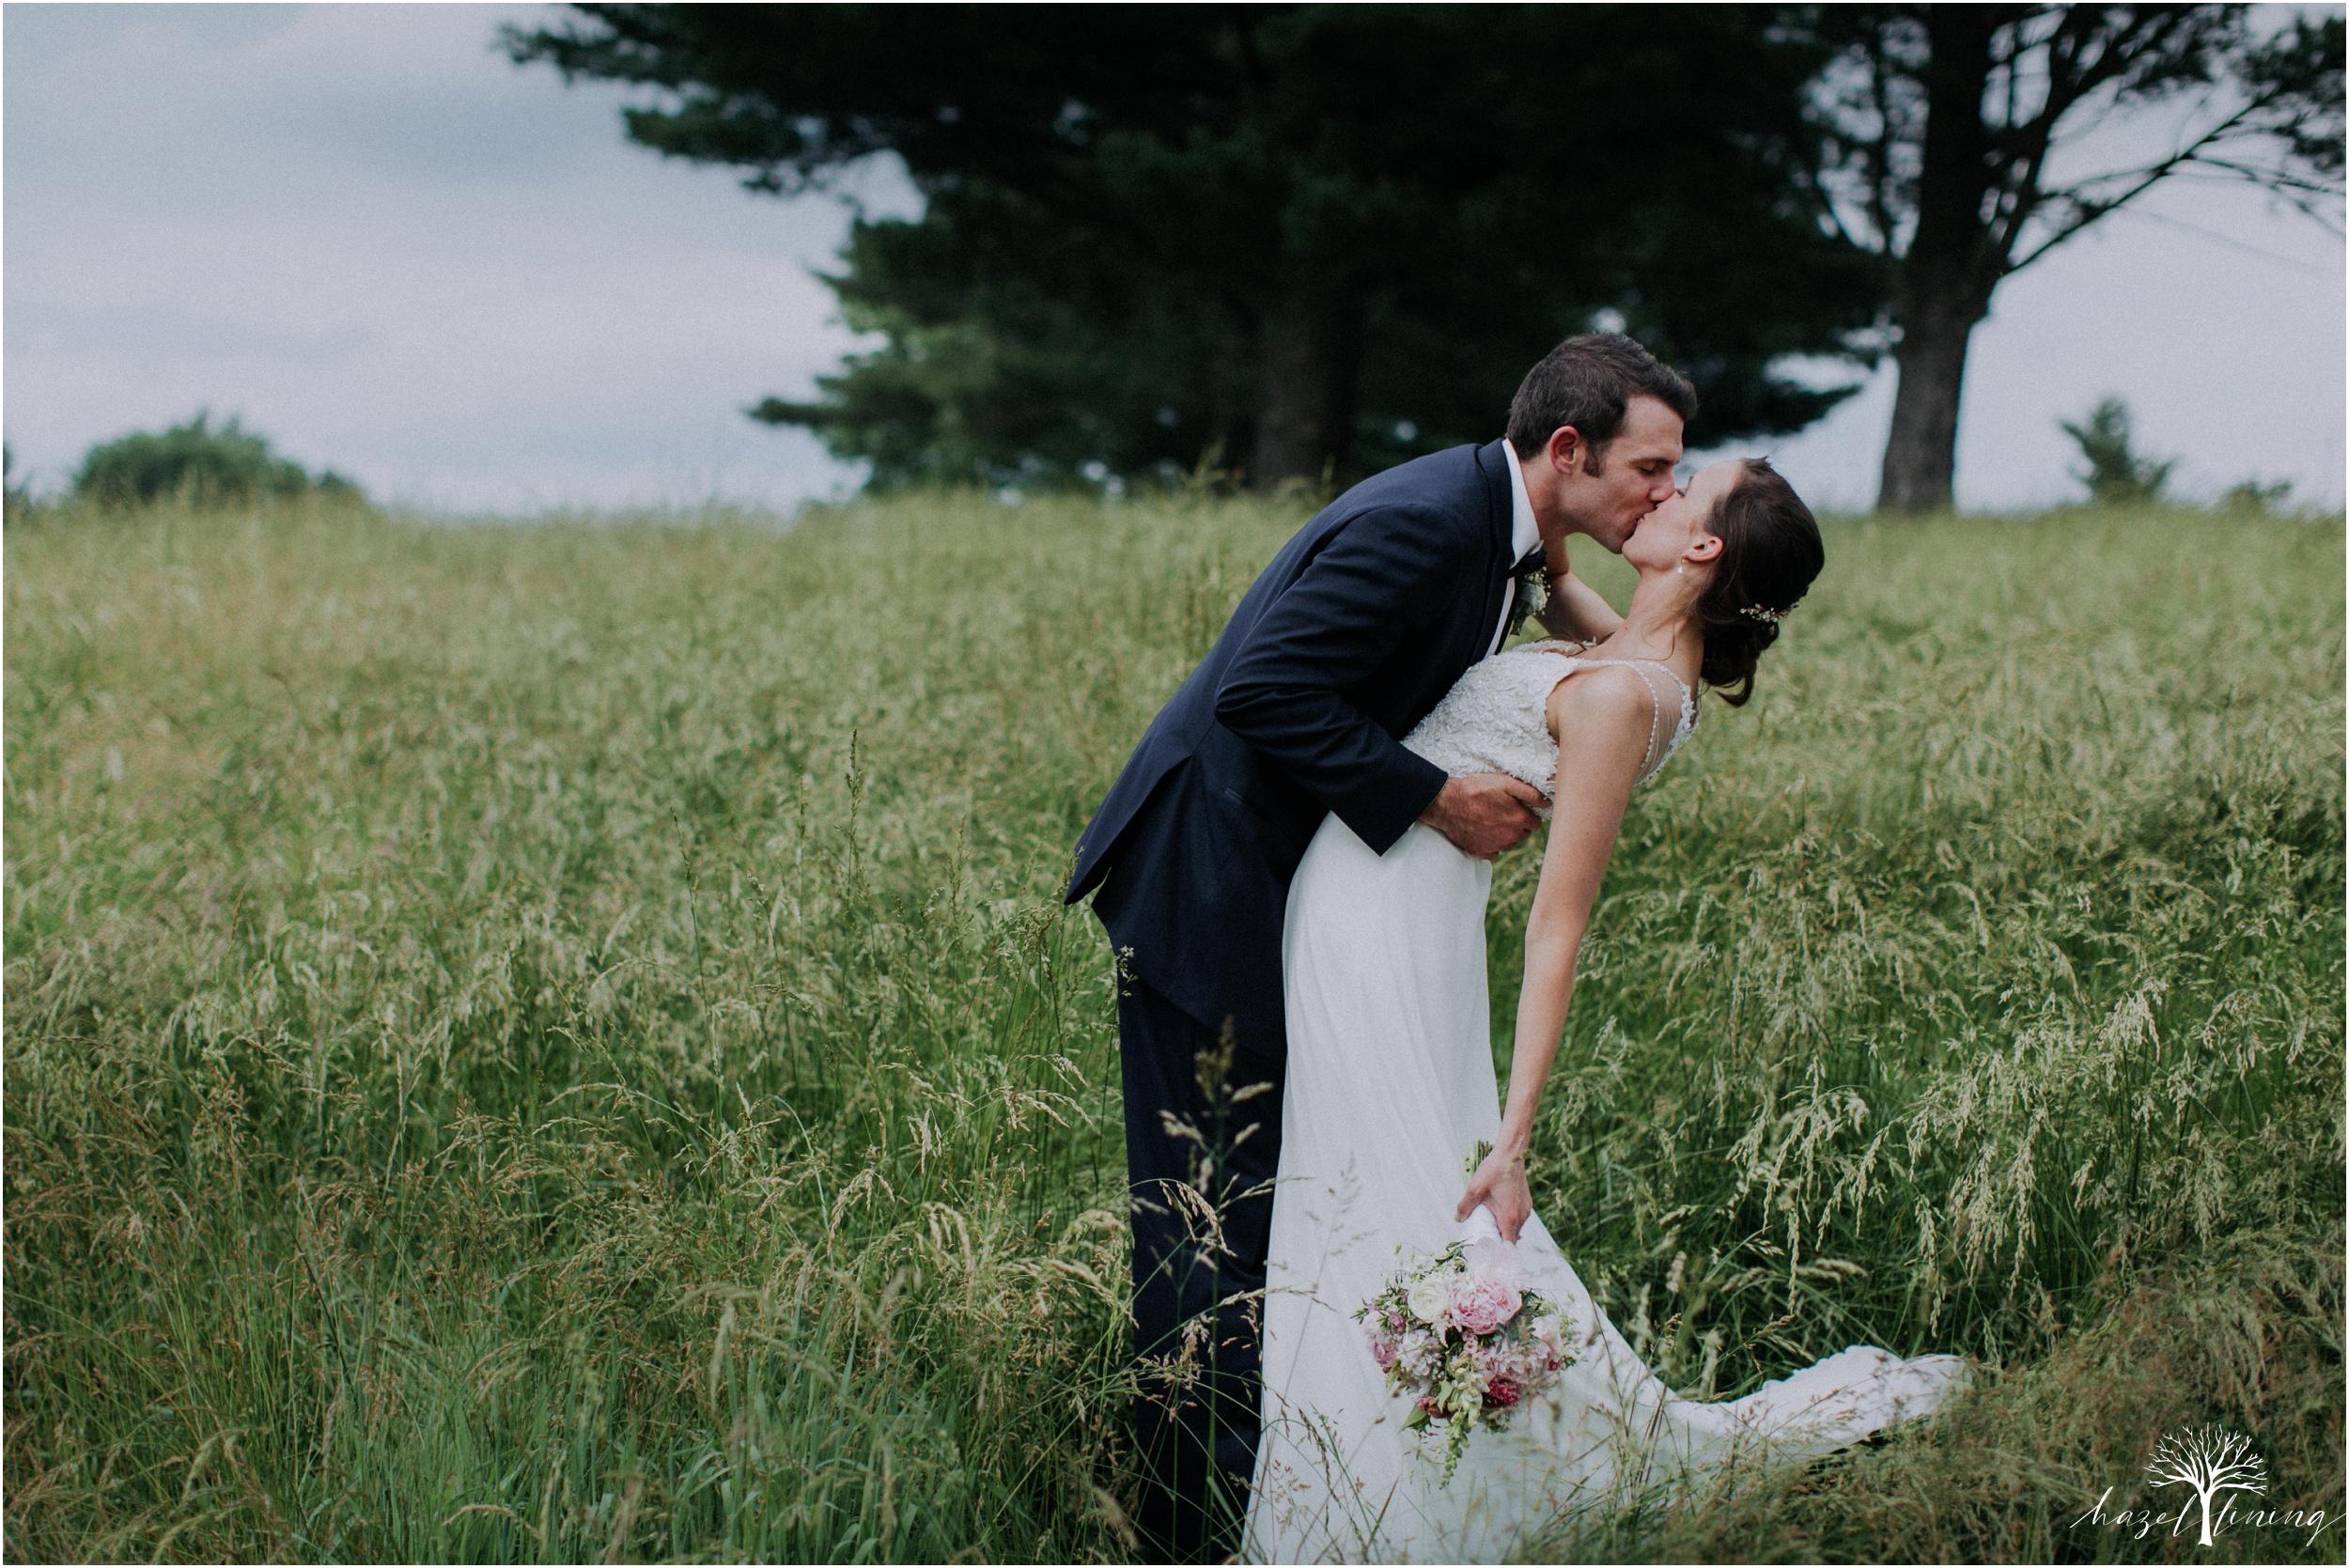 hazel-lining-travel-wedding-elopement-photography_0105.jpg